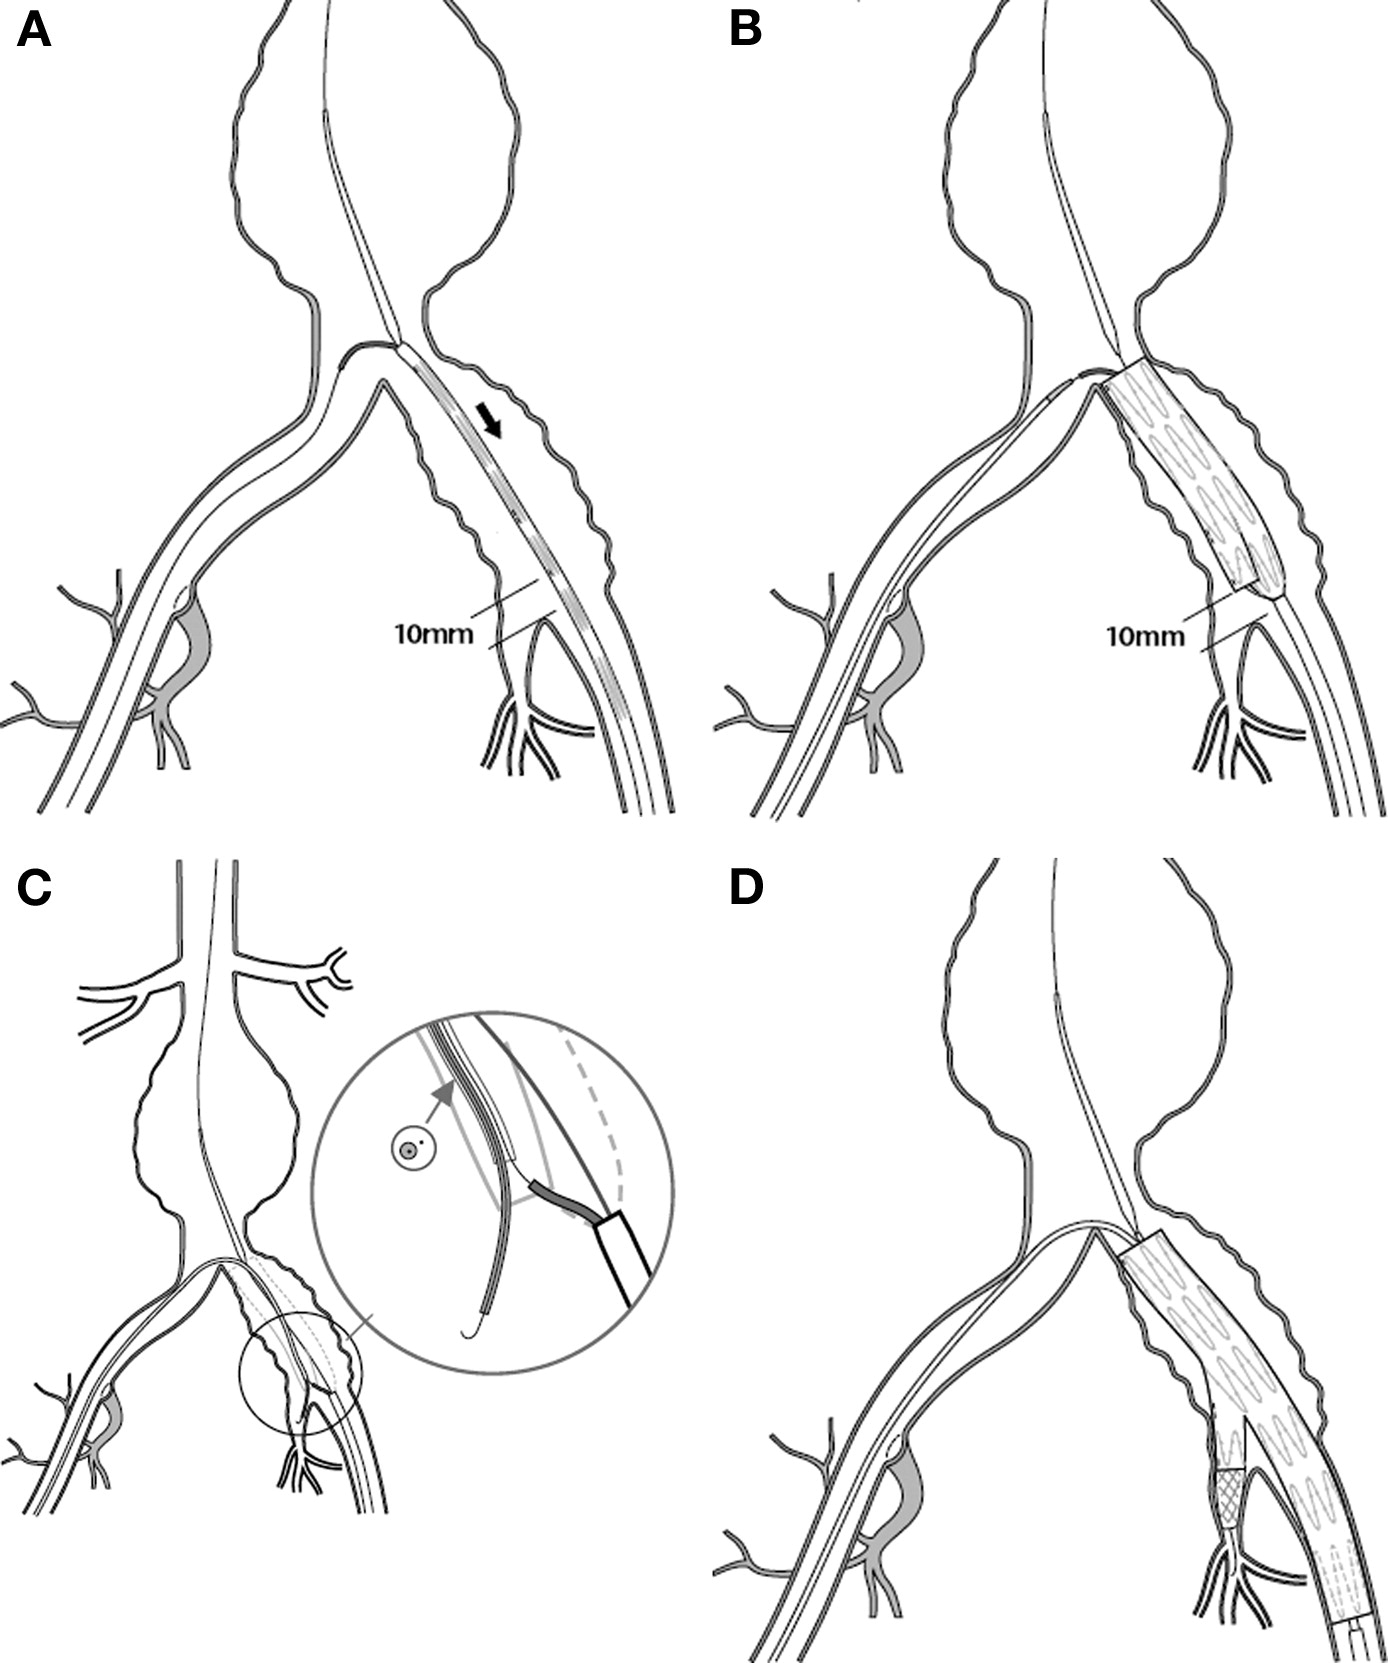 Endovascular Abdominal Aortic Aneurysm Repair In Patients